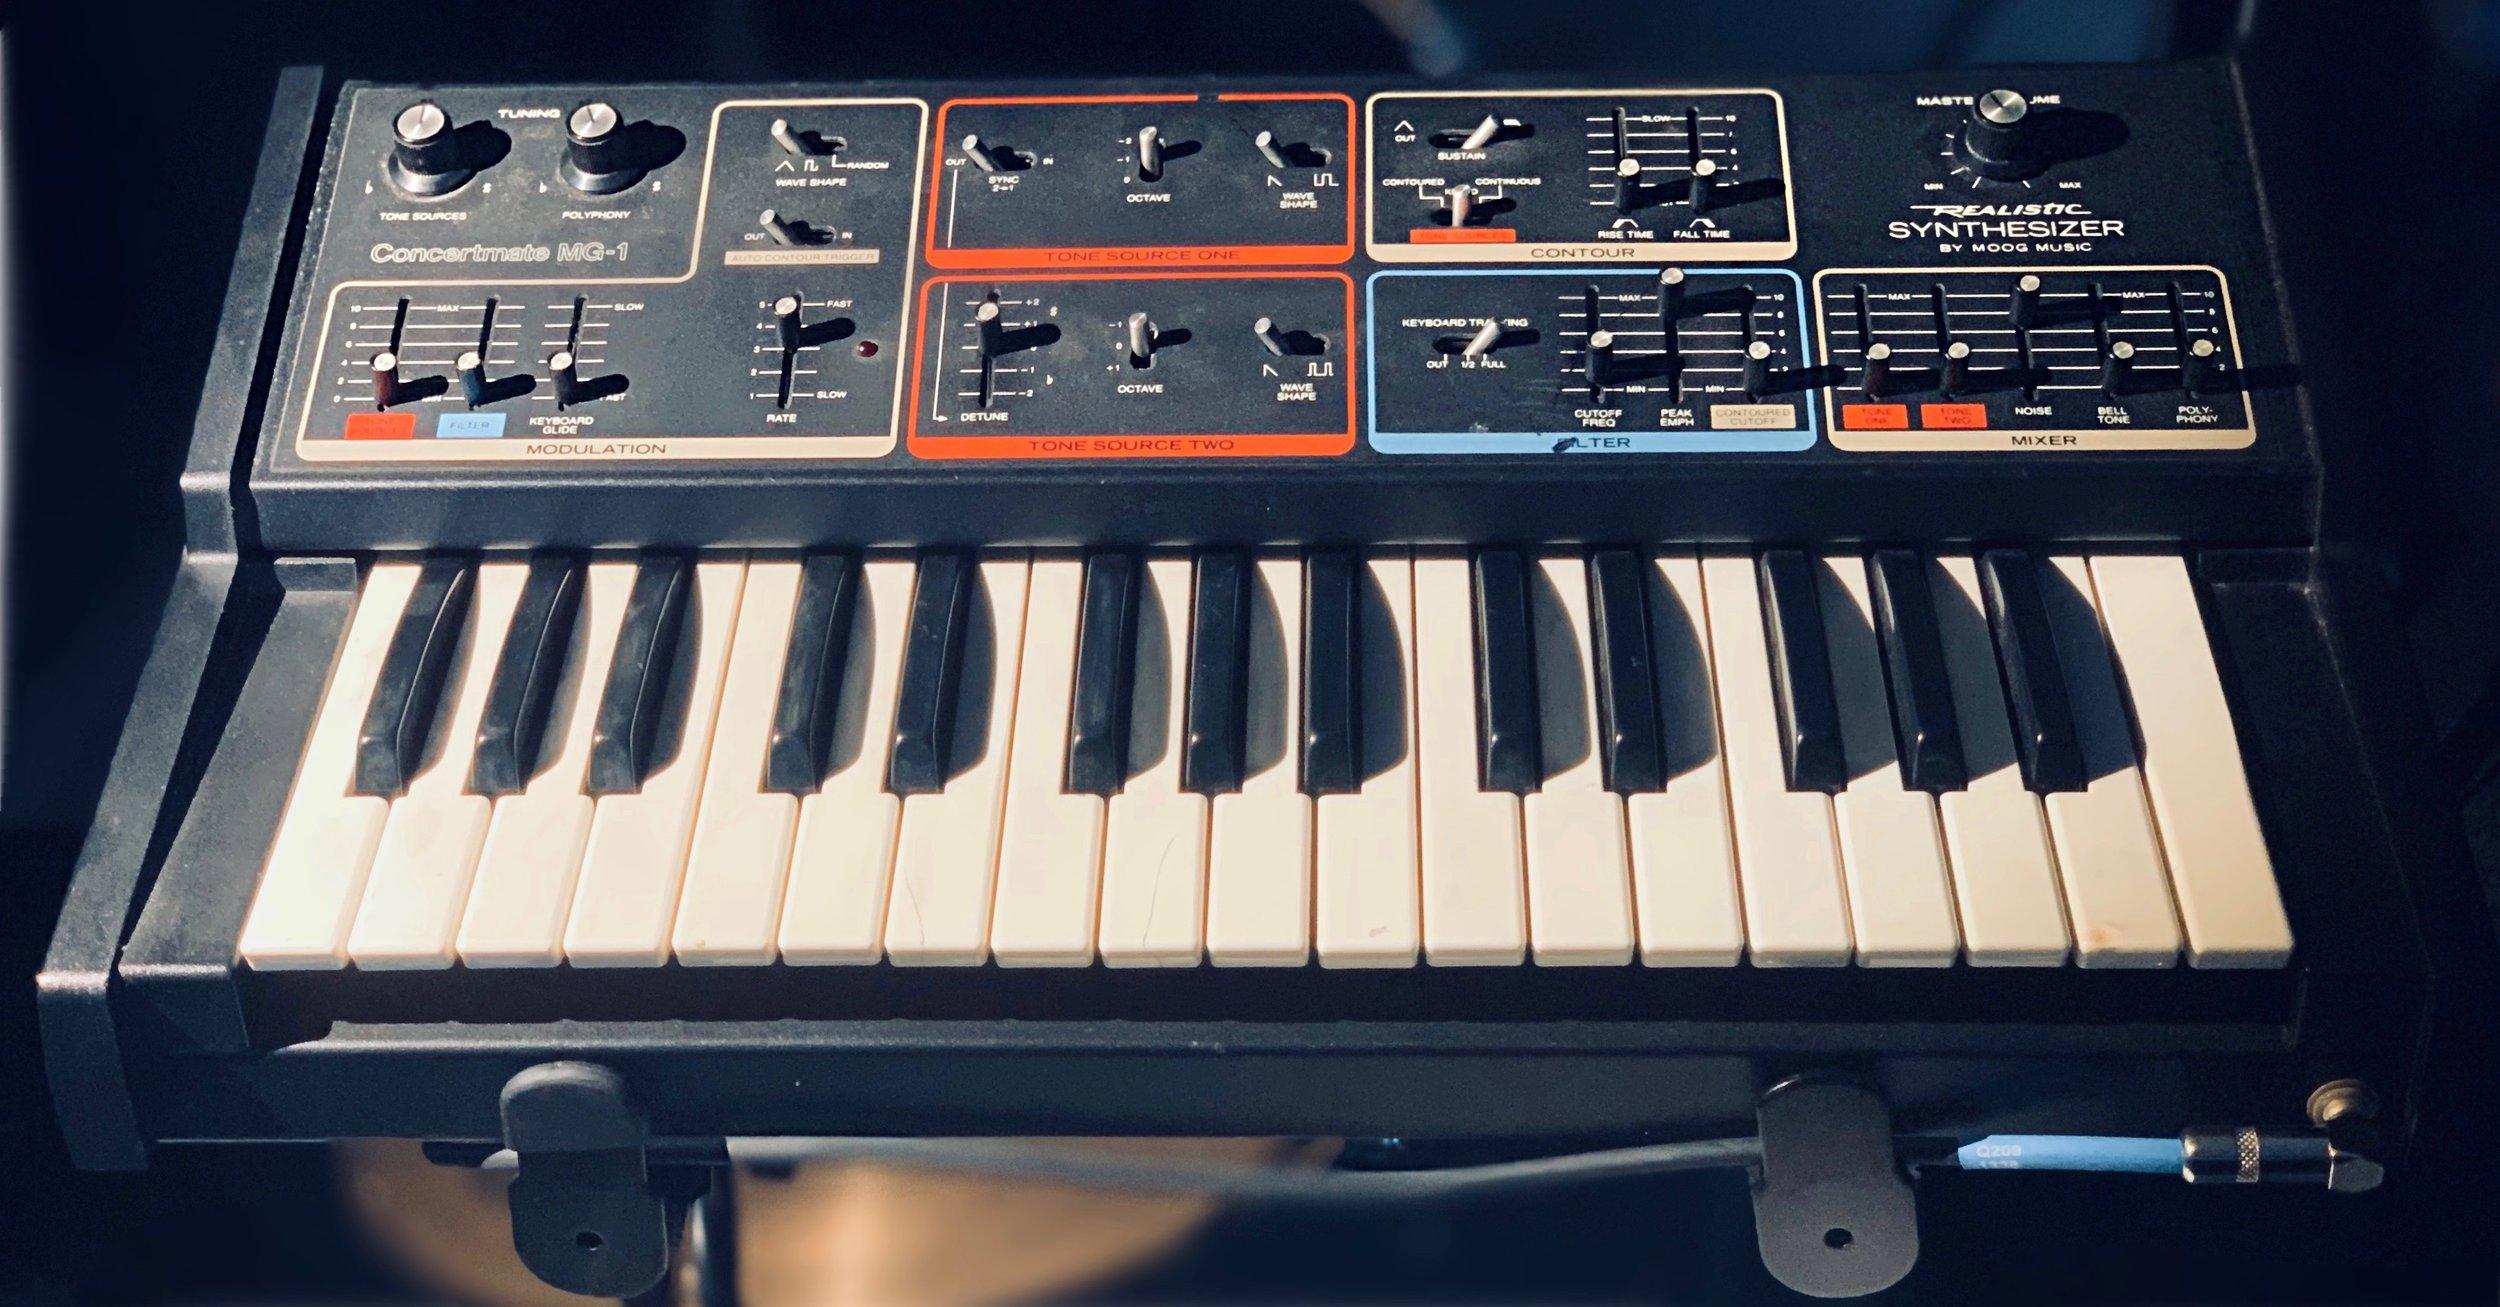 Moog MG-1 Concertmate